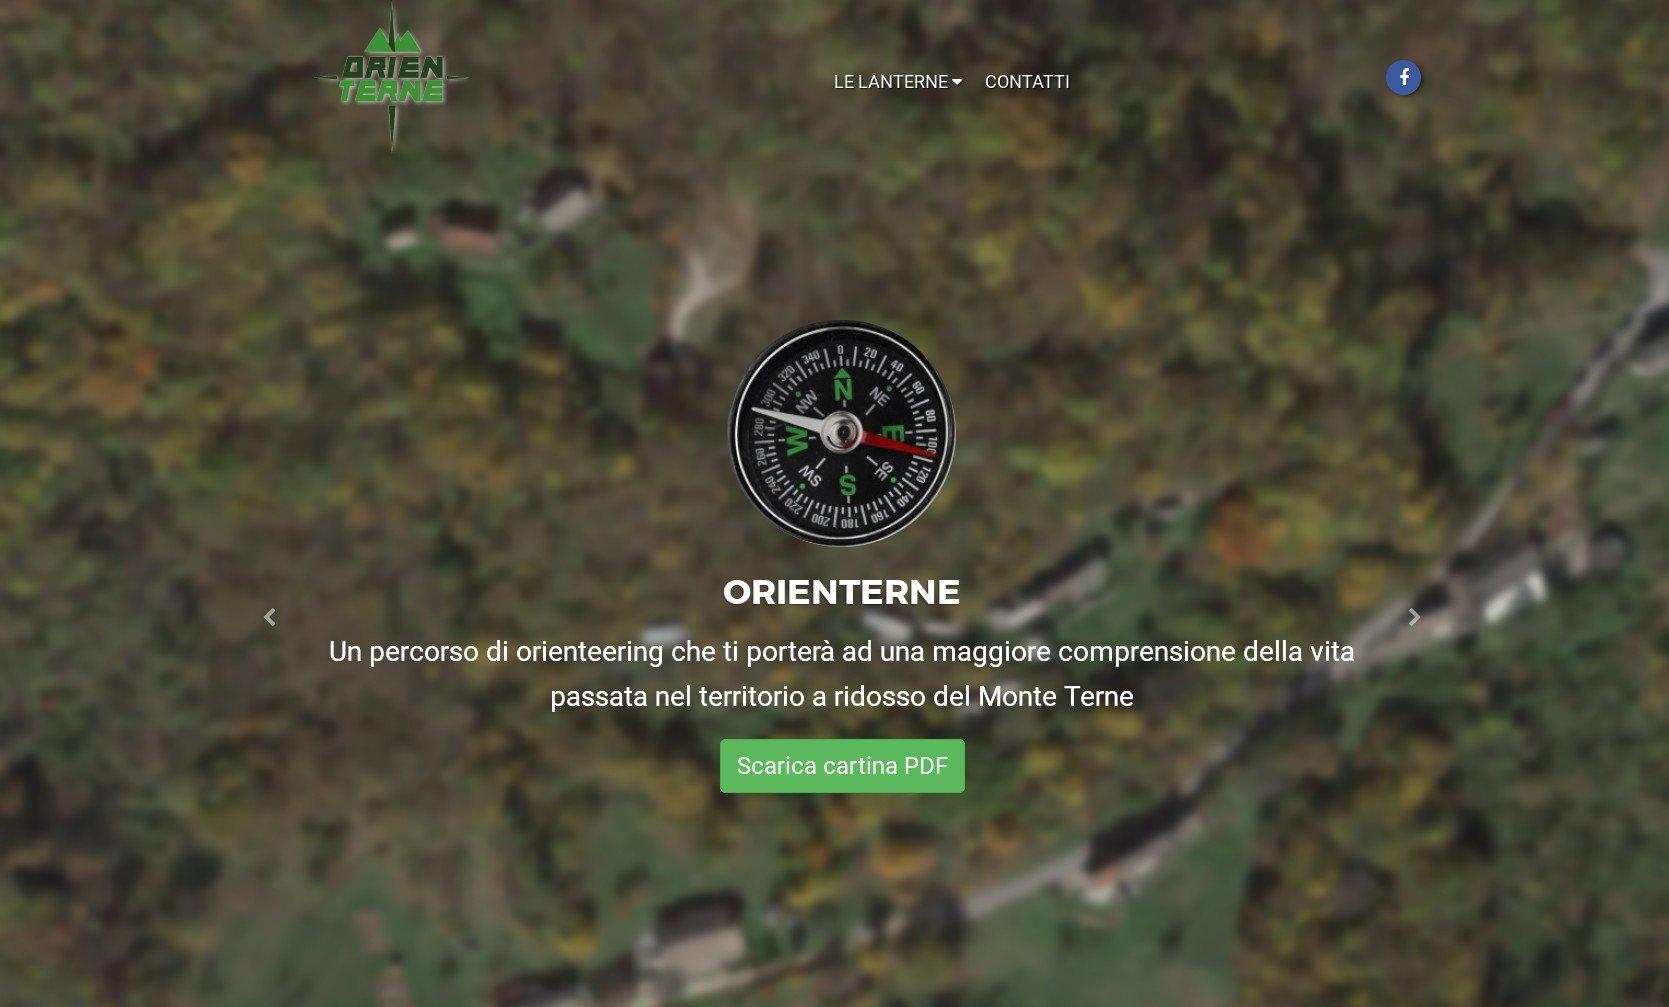 Orienterne: orienteering sul Monte Terne